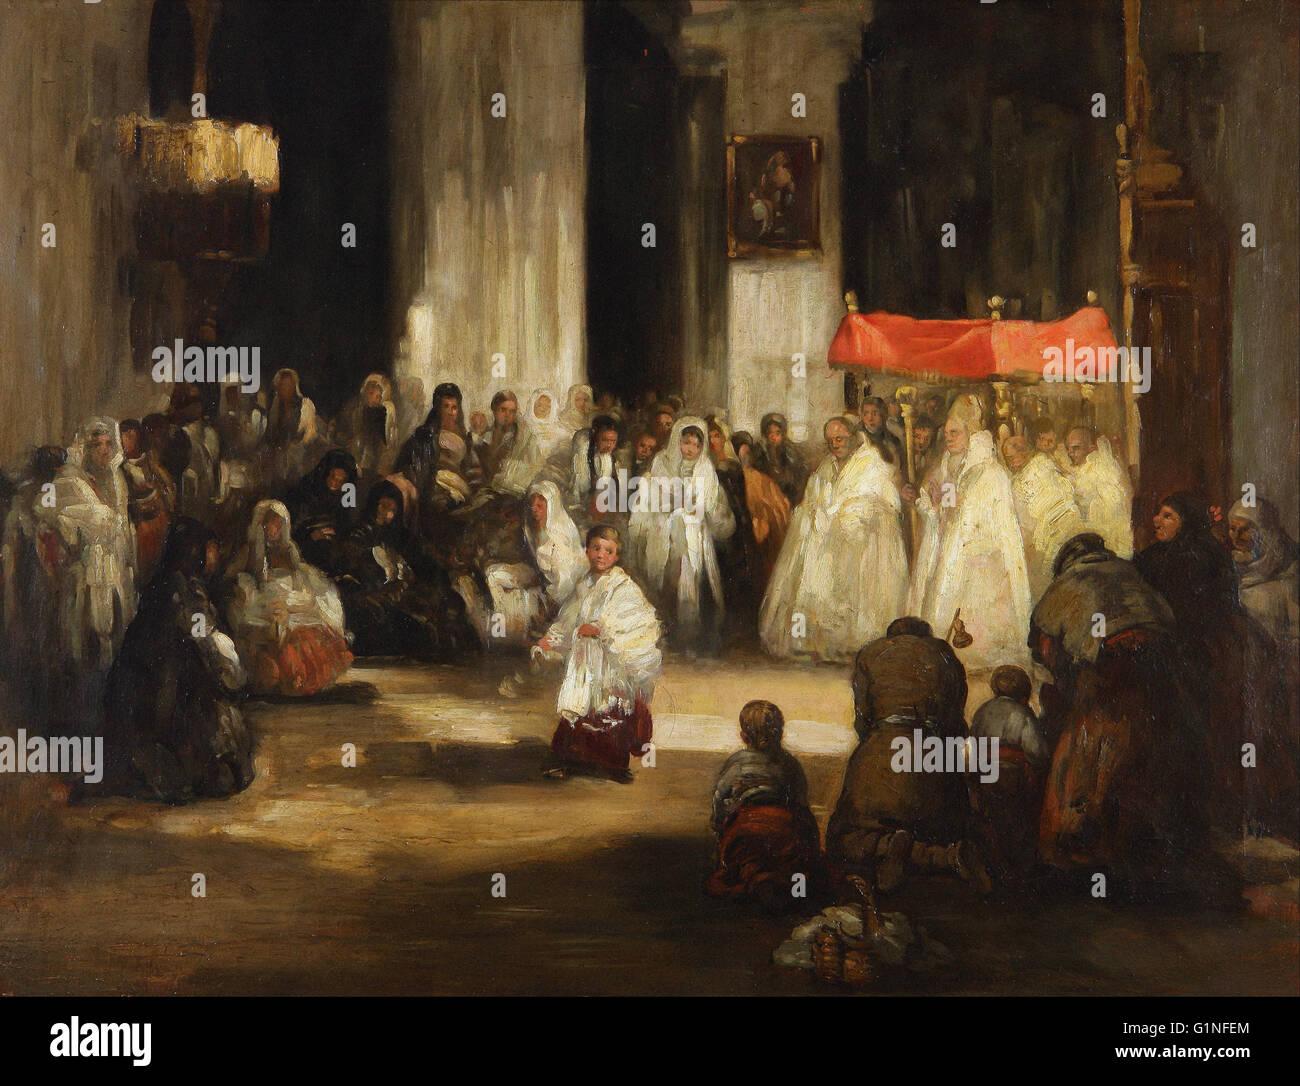 Leonardo Alenza - großer Gott - Museo del Romanticismo, Madrid Stockbild